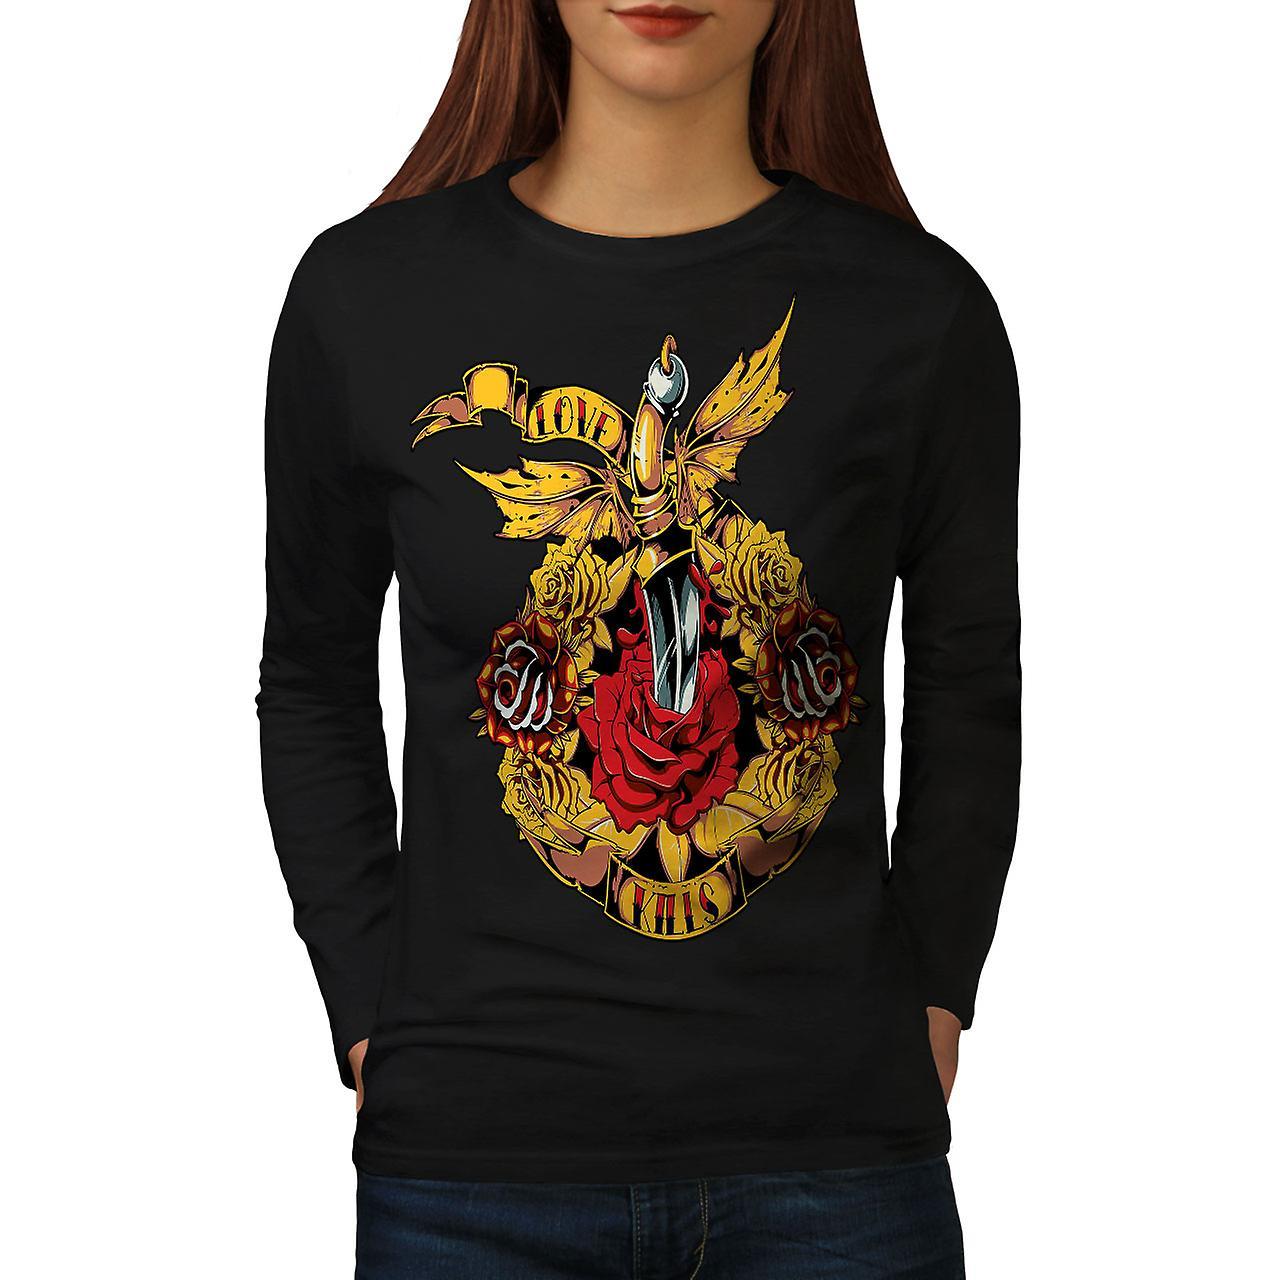 Love Kills Rose femmes noirLong Sleeve T-shirt | Wellcoda